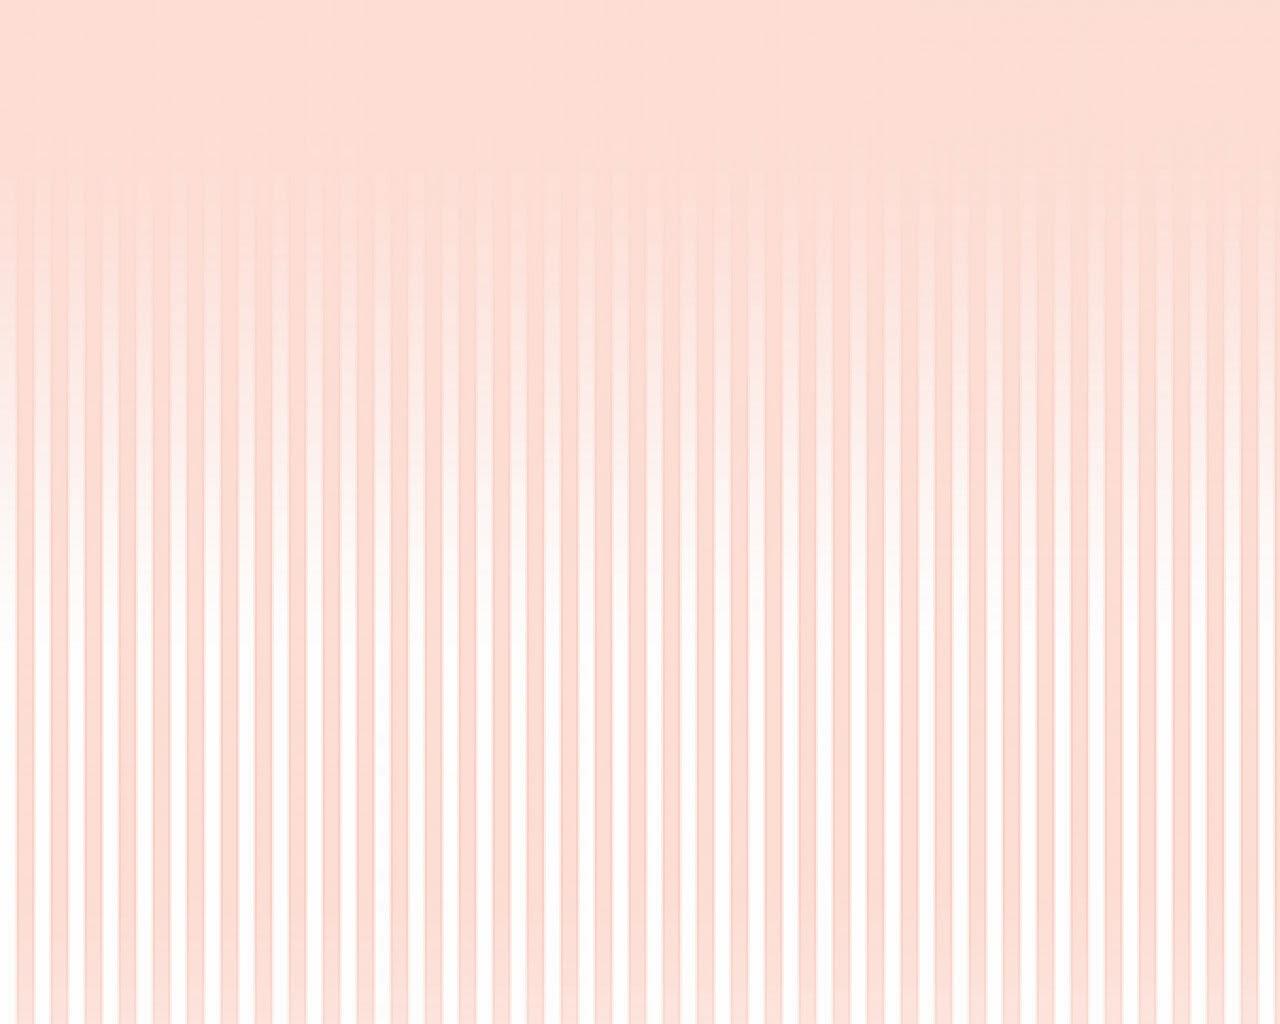 free download wallpaper pink peach colour stripe pattern list stripe wallpaper pink 1280x1024 for your desktop mobile tablet explore 47 pink stripe wallpaper blue and green striped wallpaper pink free download wallpaper pink peach